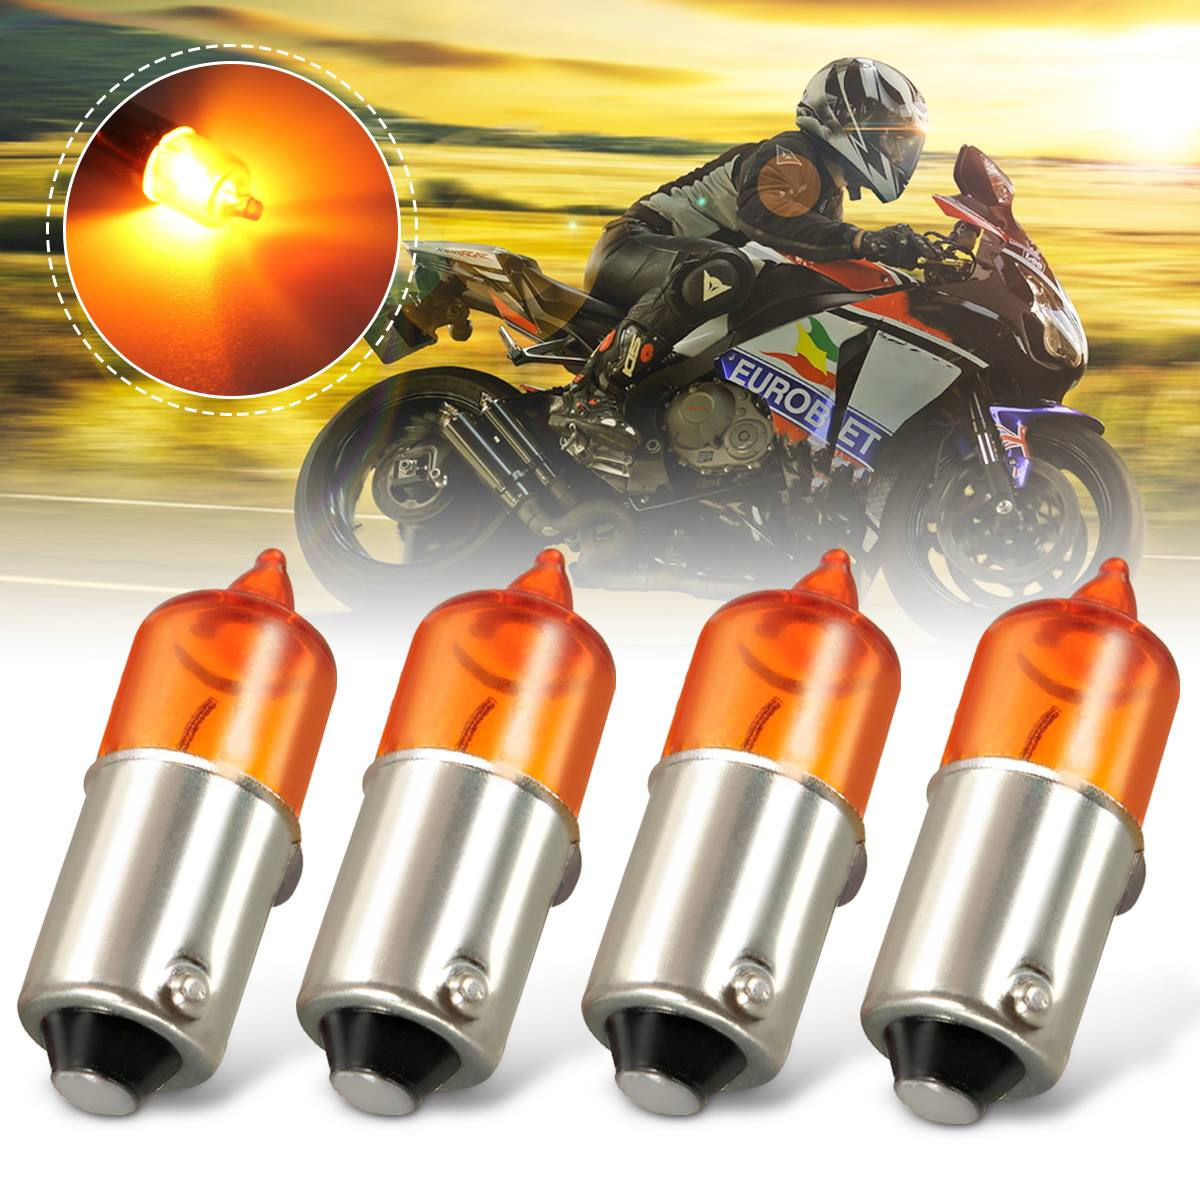 4pcs 12V 23W Amber Universal Mini Miniature Turn Signal Indicator Light Bulbs For Auto Car Motorcycle Motorbike Scooter